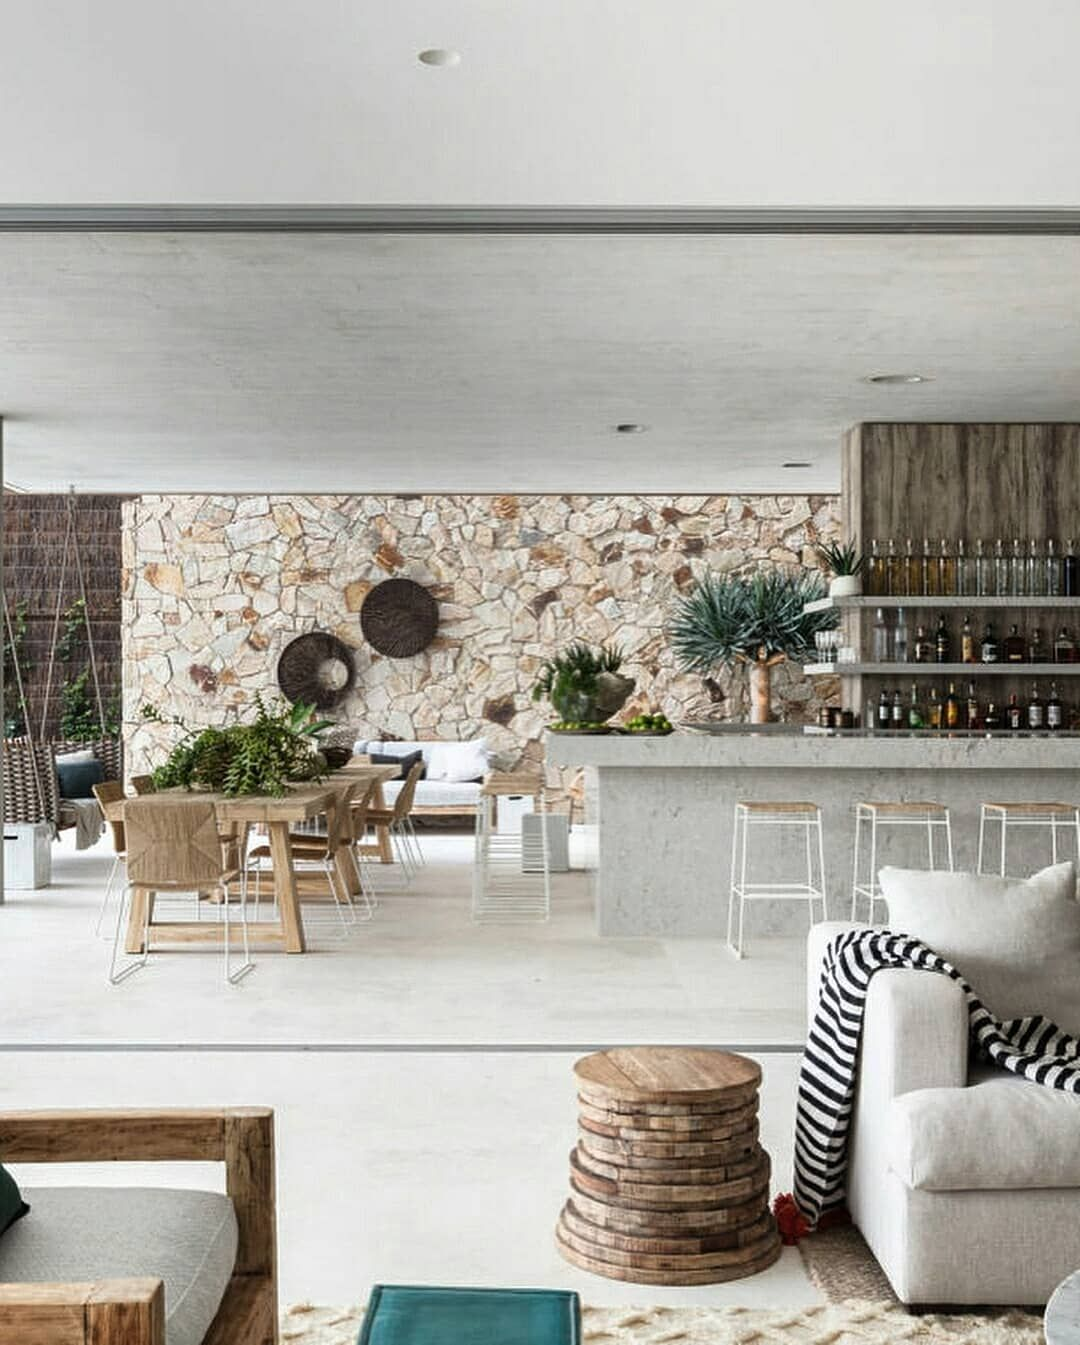 Interior Design 54 Architecture Architects Archilovers Awesome Amazing Goodmorning Usa Losangeles Landscape Facade Design